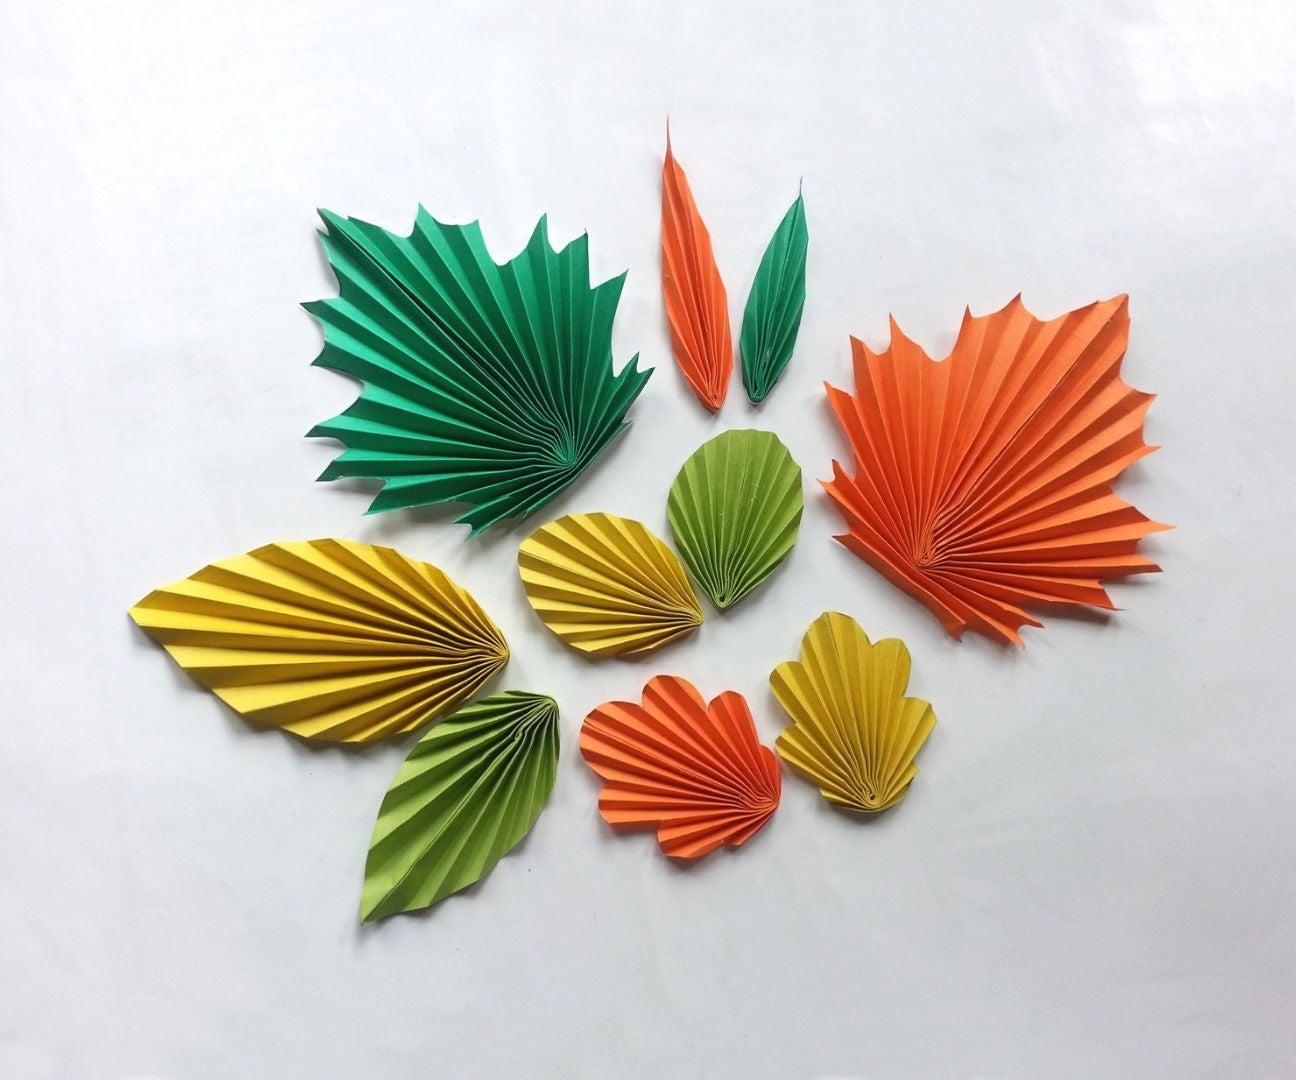 Genuine Japanese Origami, Book 1: 33 Mathematical Models Based ... | 1080x1296